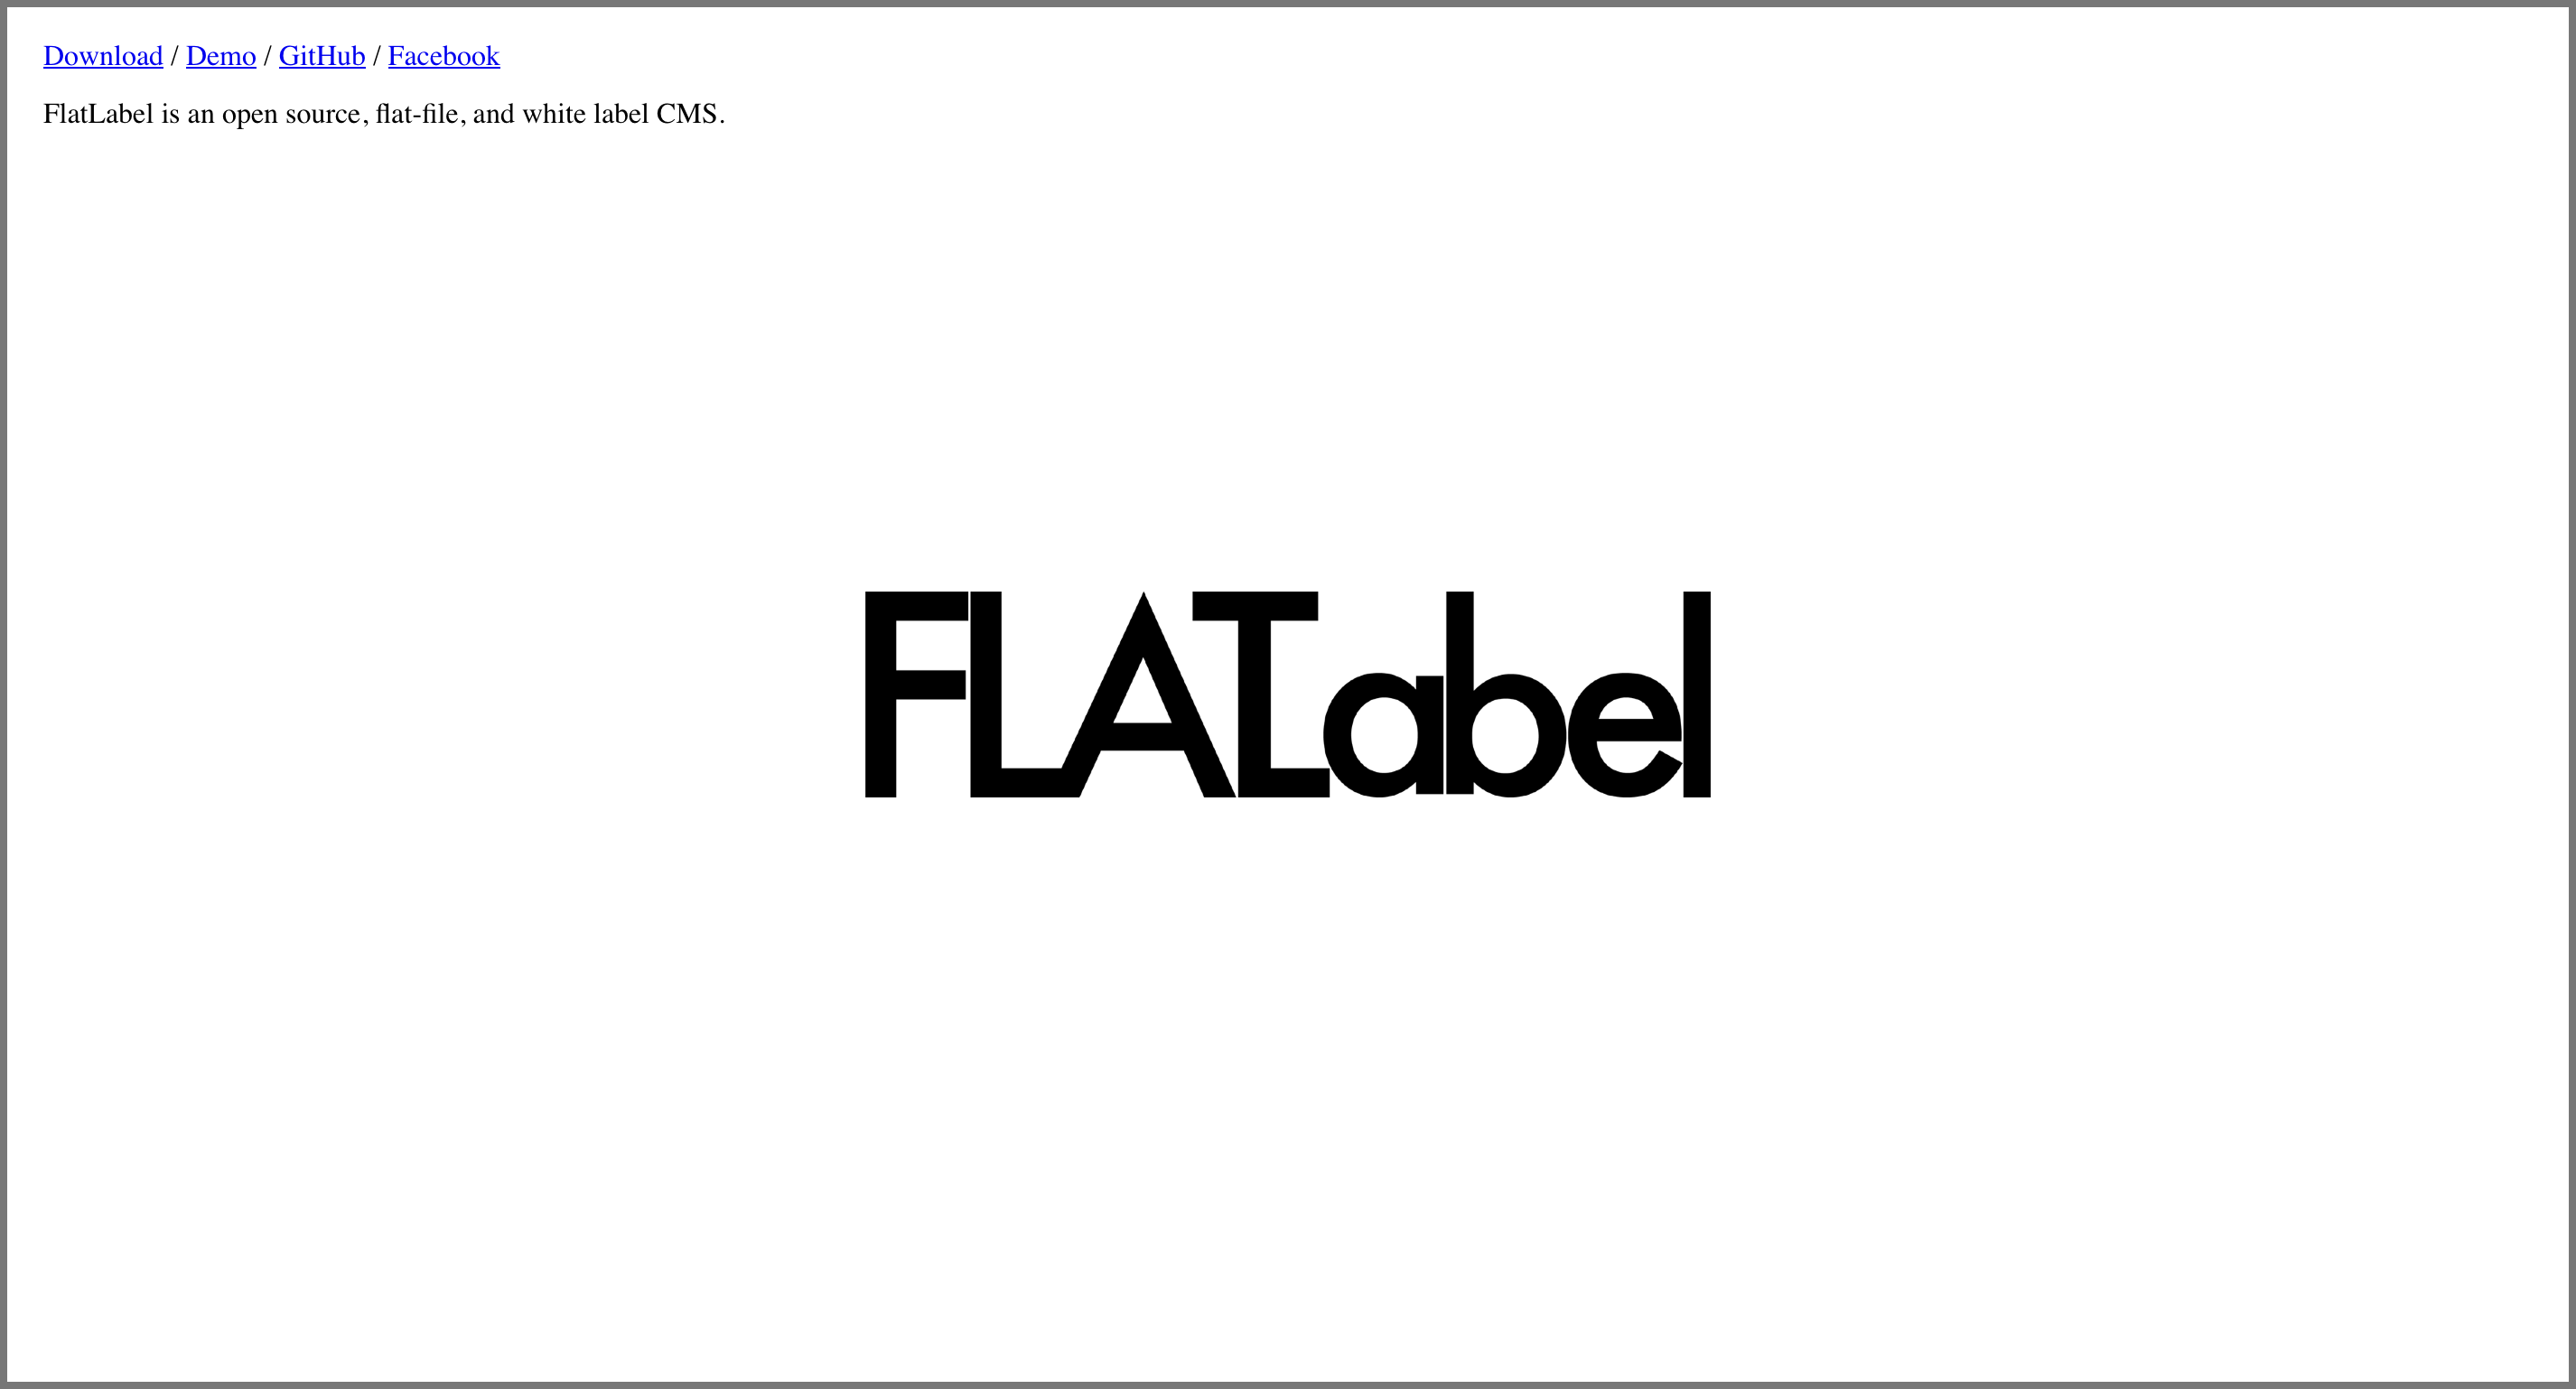 FlatLabel